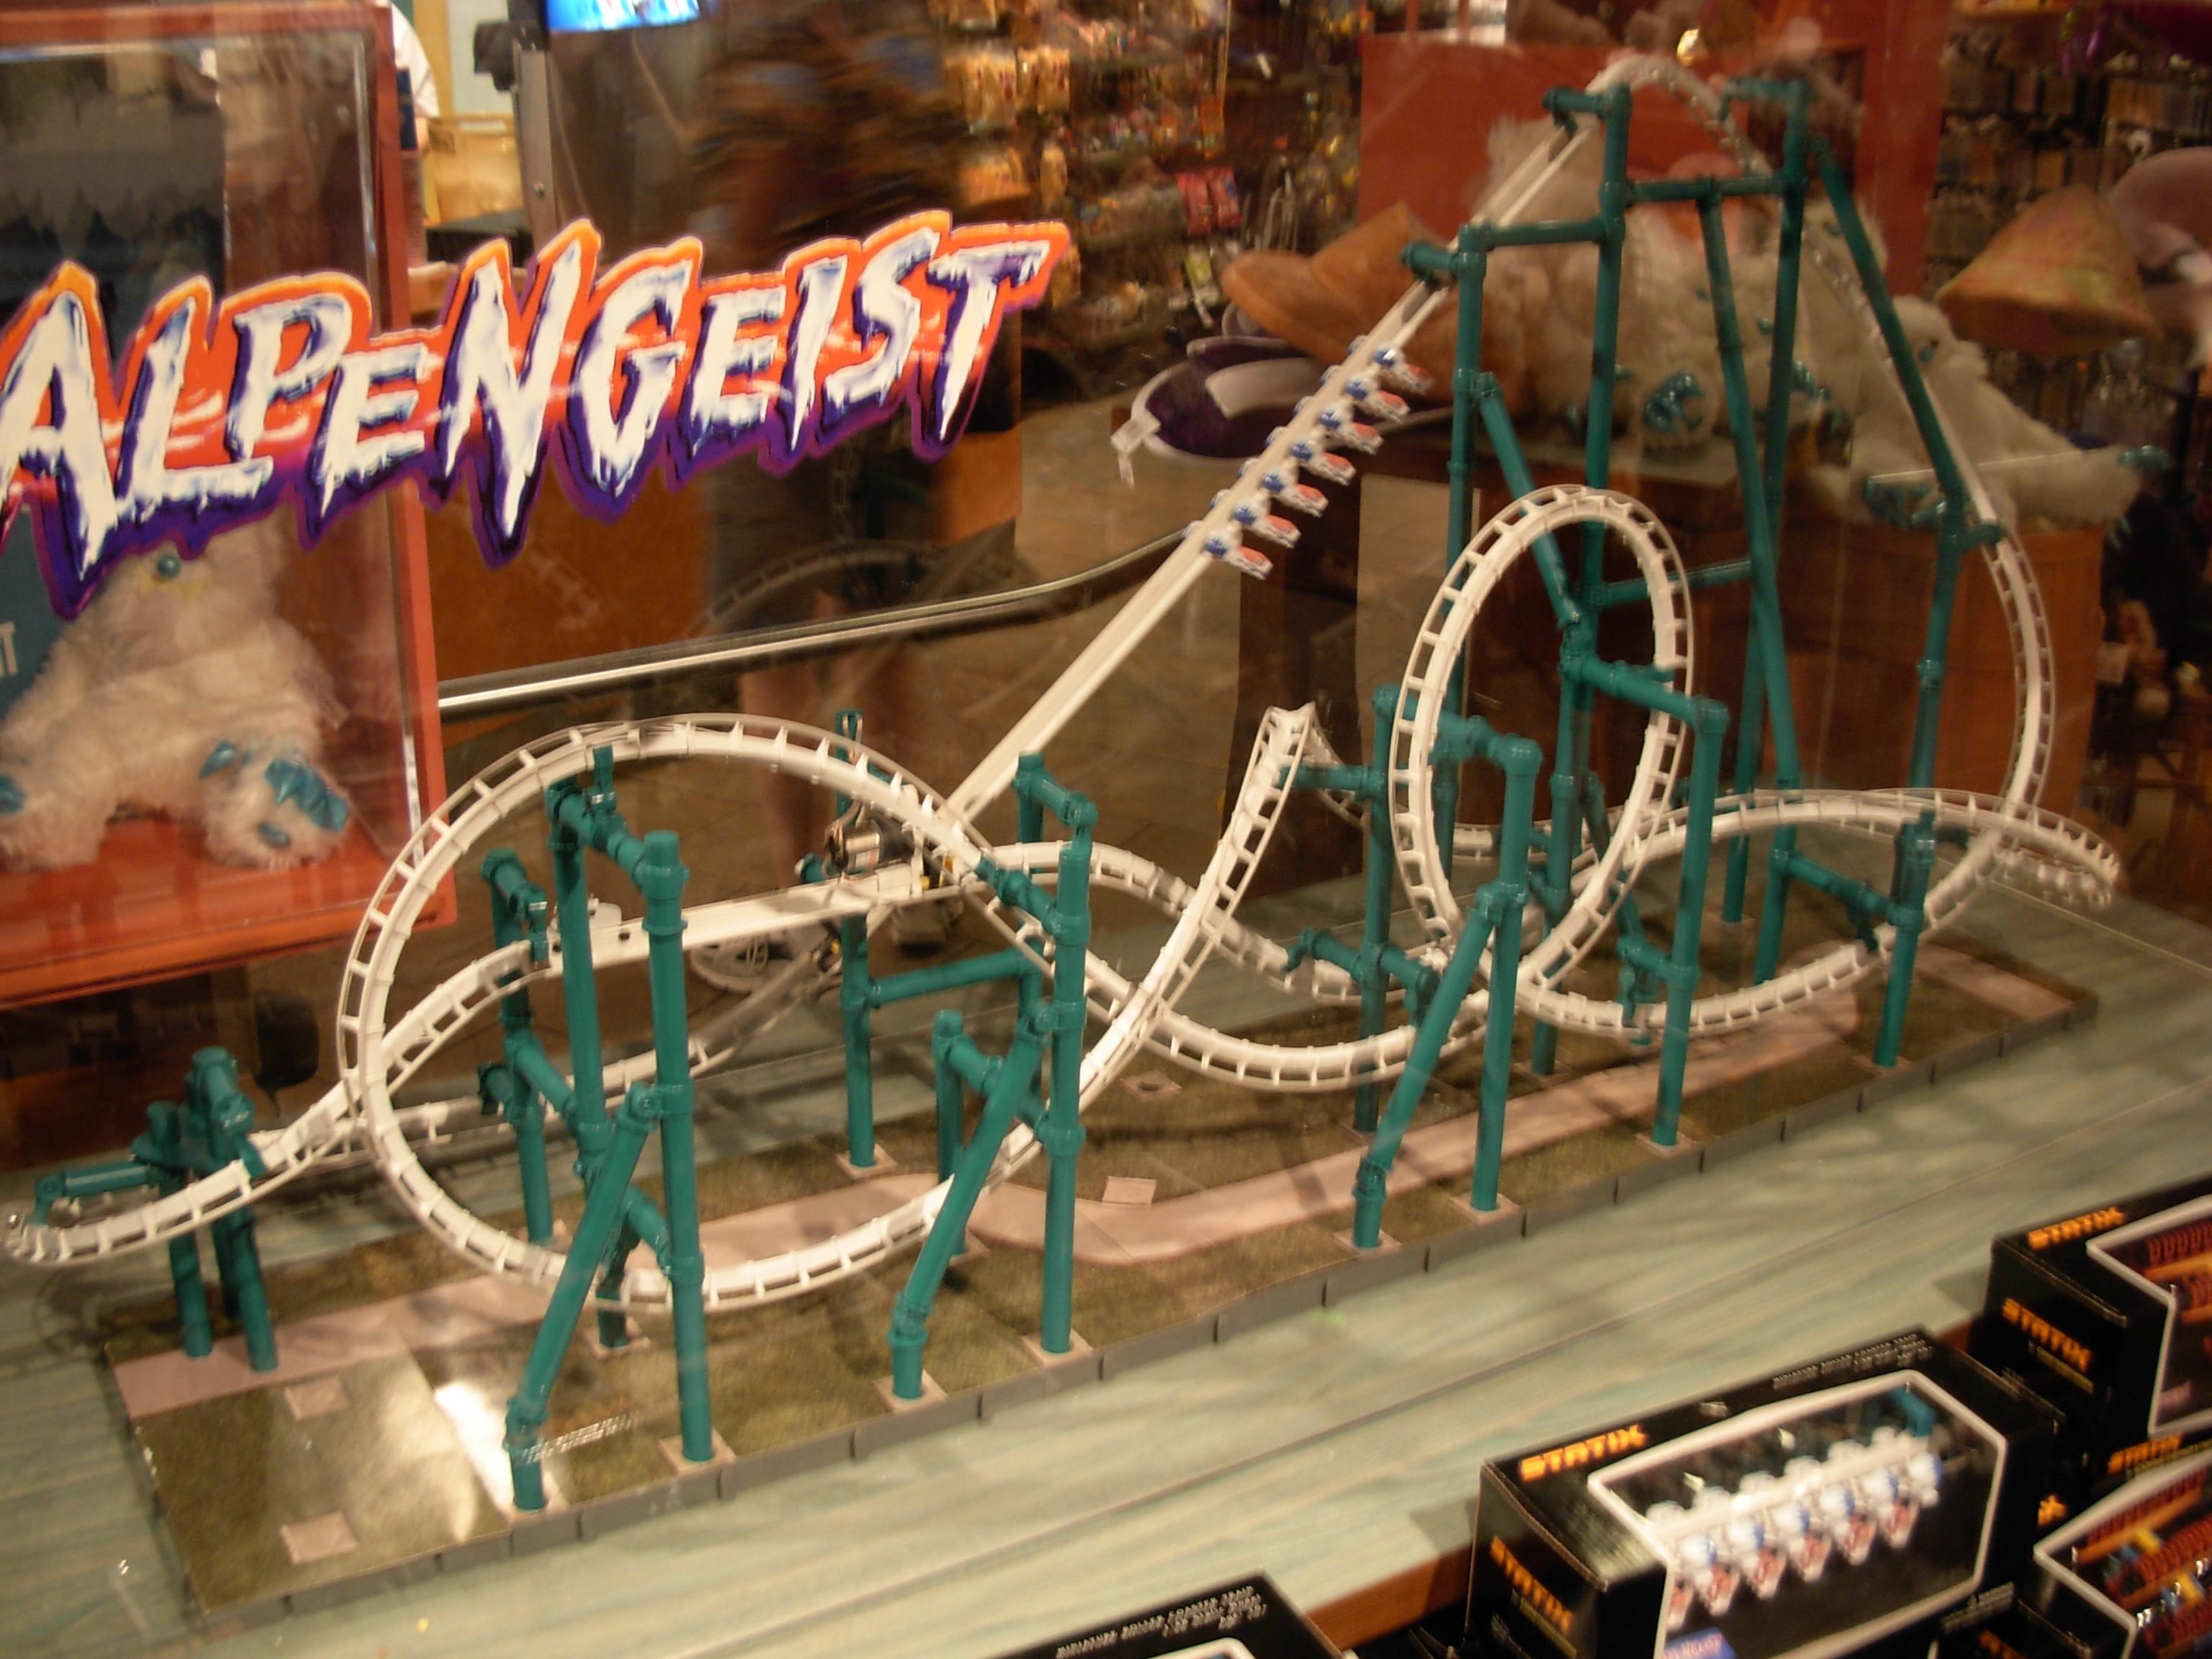 File:Alpengeist model (Busch Gardens Williamsburg).jpg - Wikimedia ...